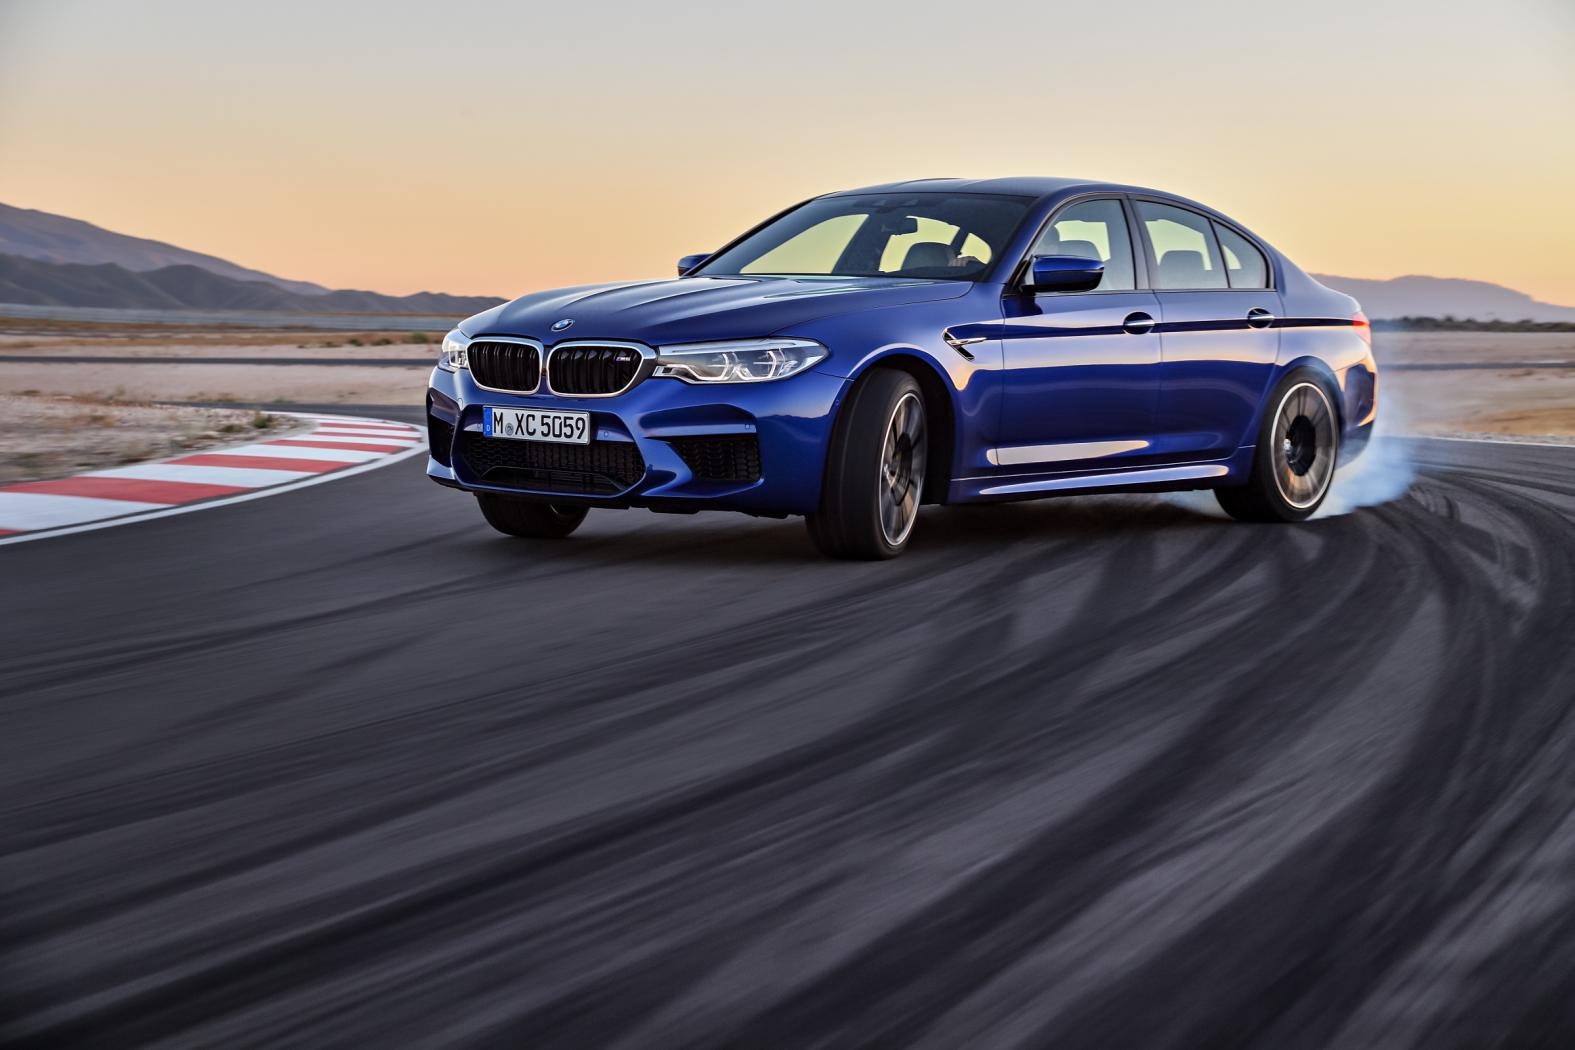 BMW-M5-F90-5.jpeg